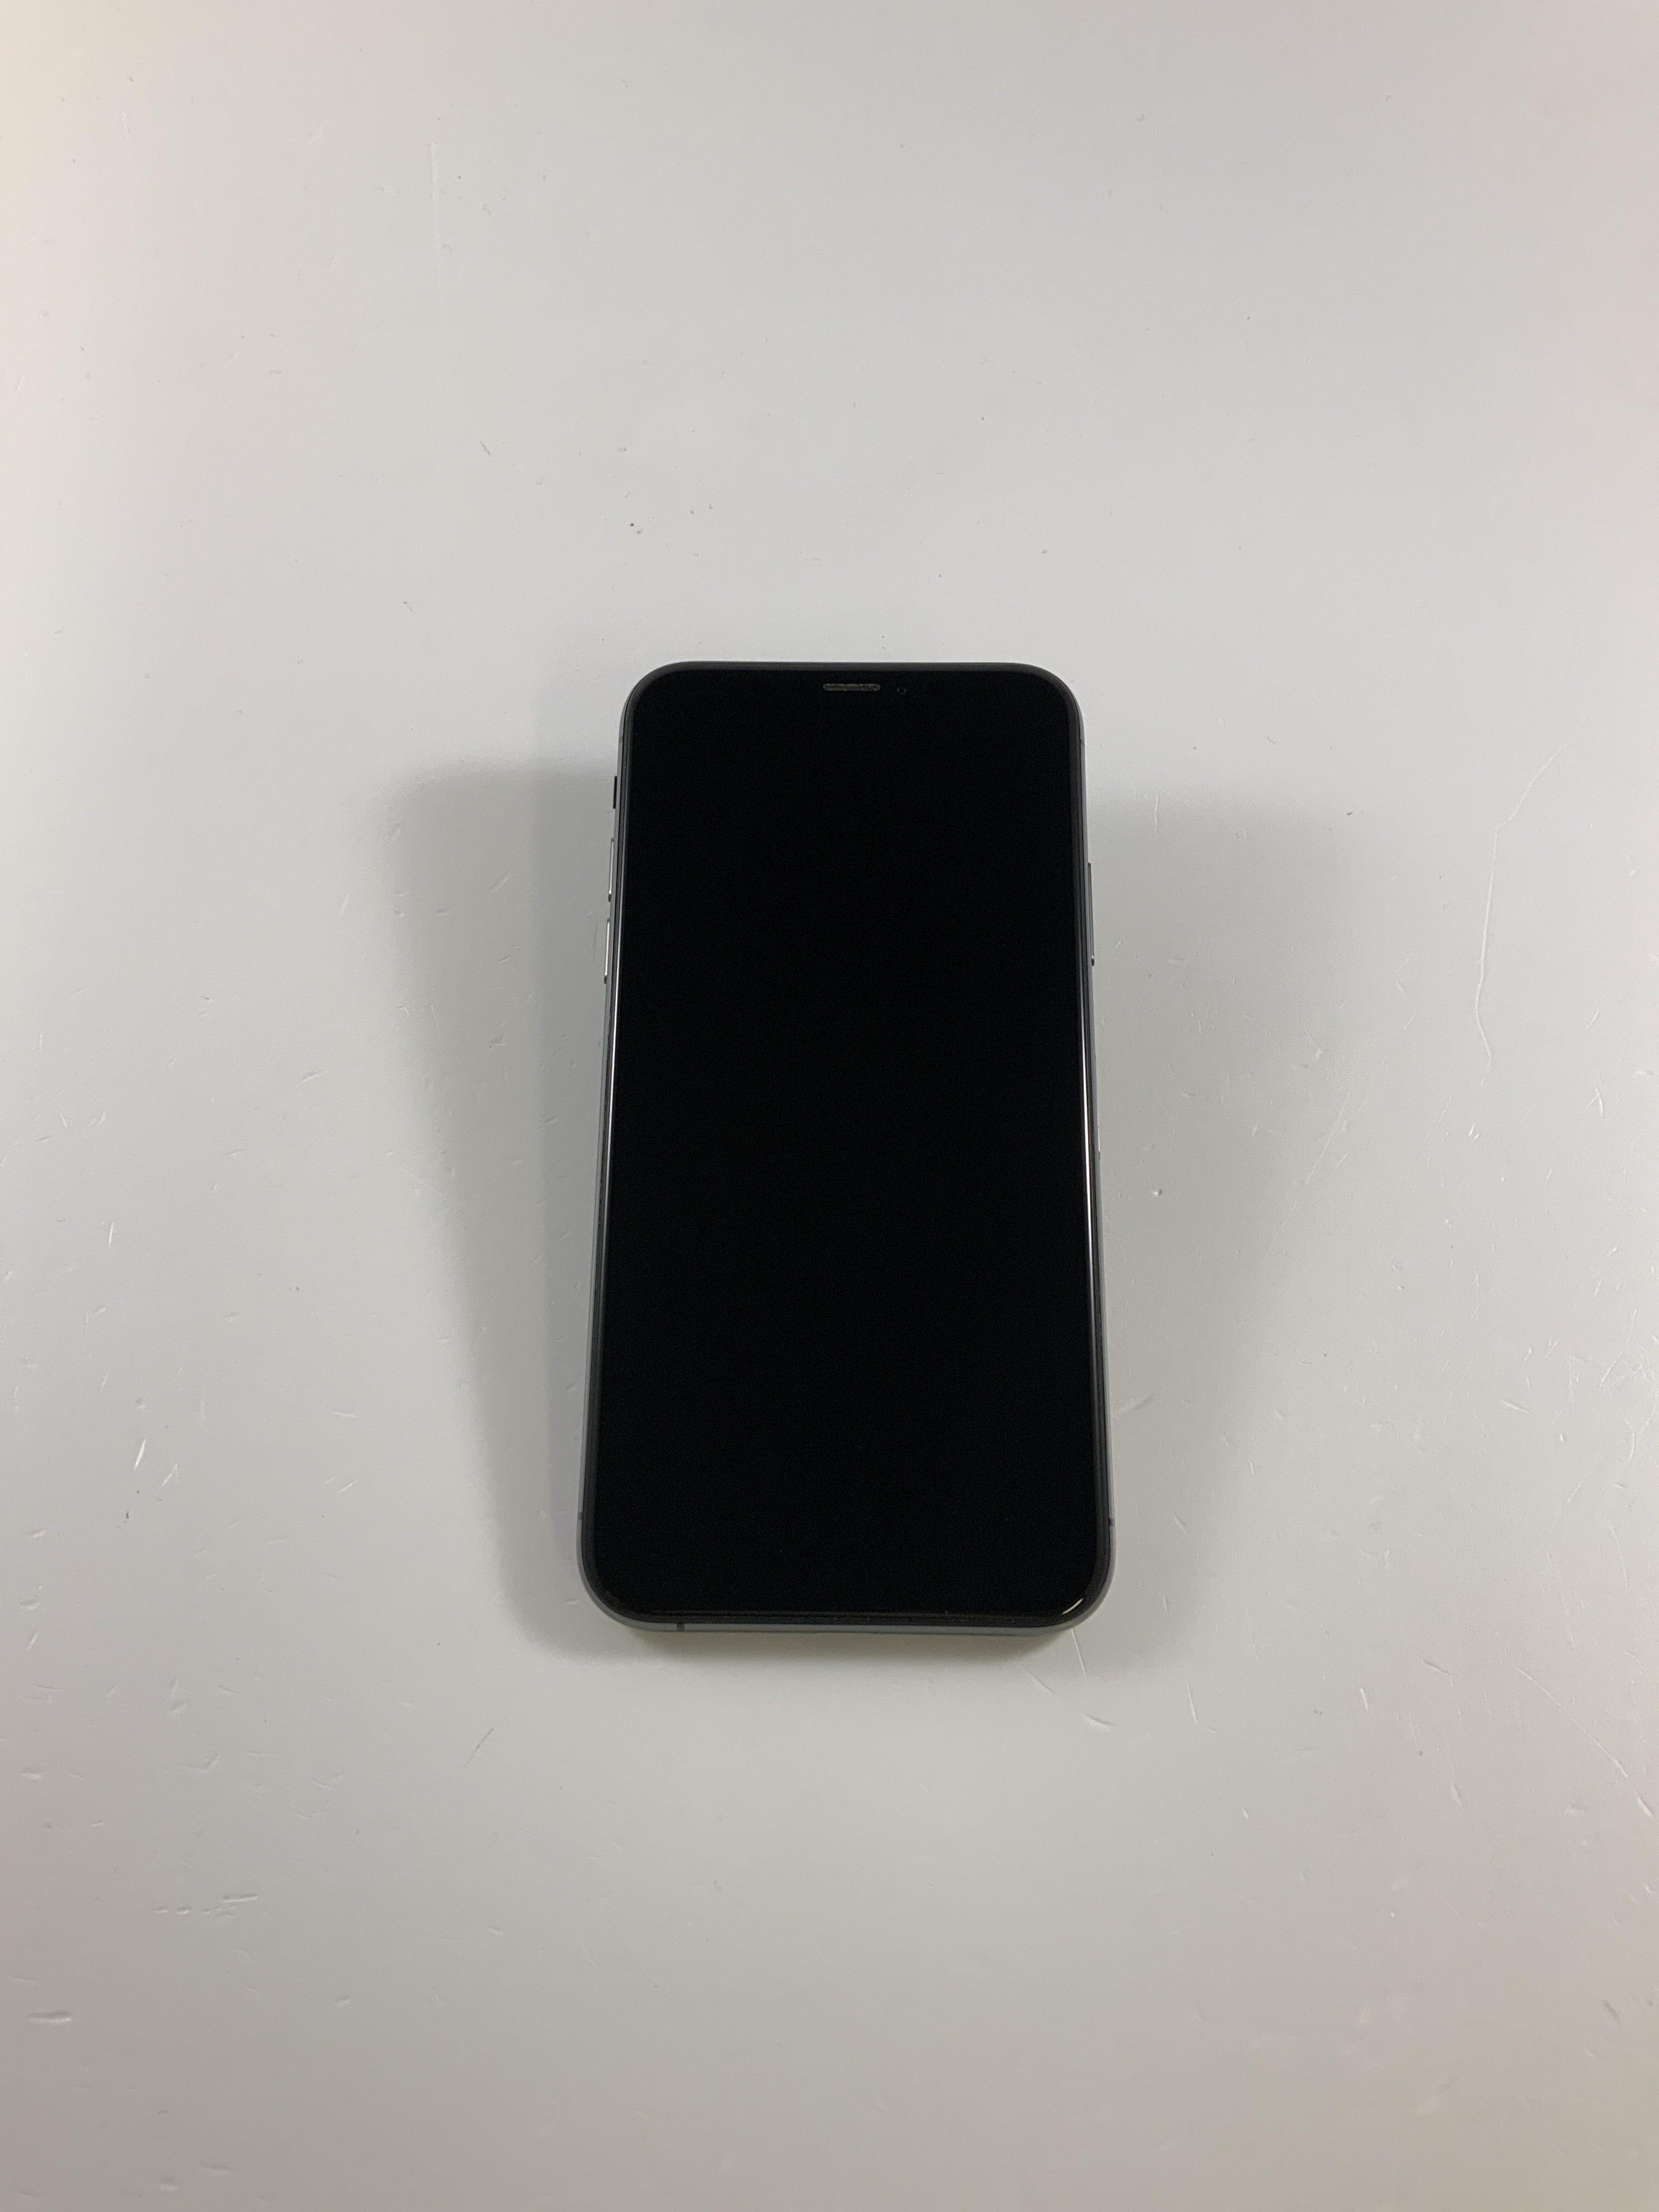 iPhone XS 64GB, 64GB, Space Gray, imagen 1